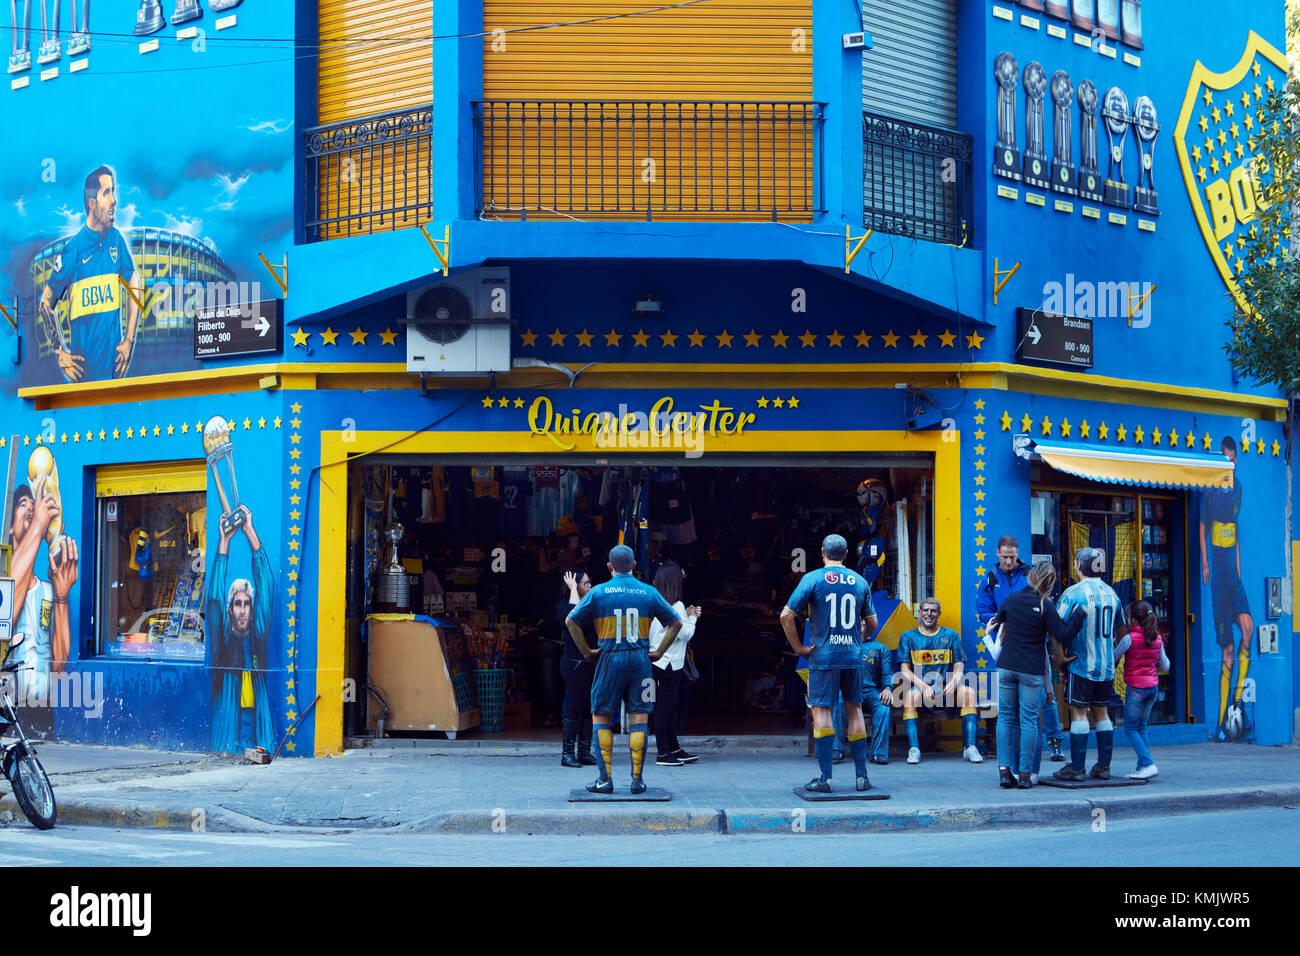 2cc33774cd939 Tienda de fútbol Boca Juniors